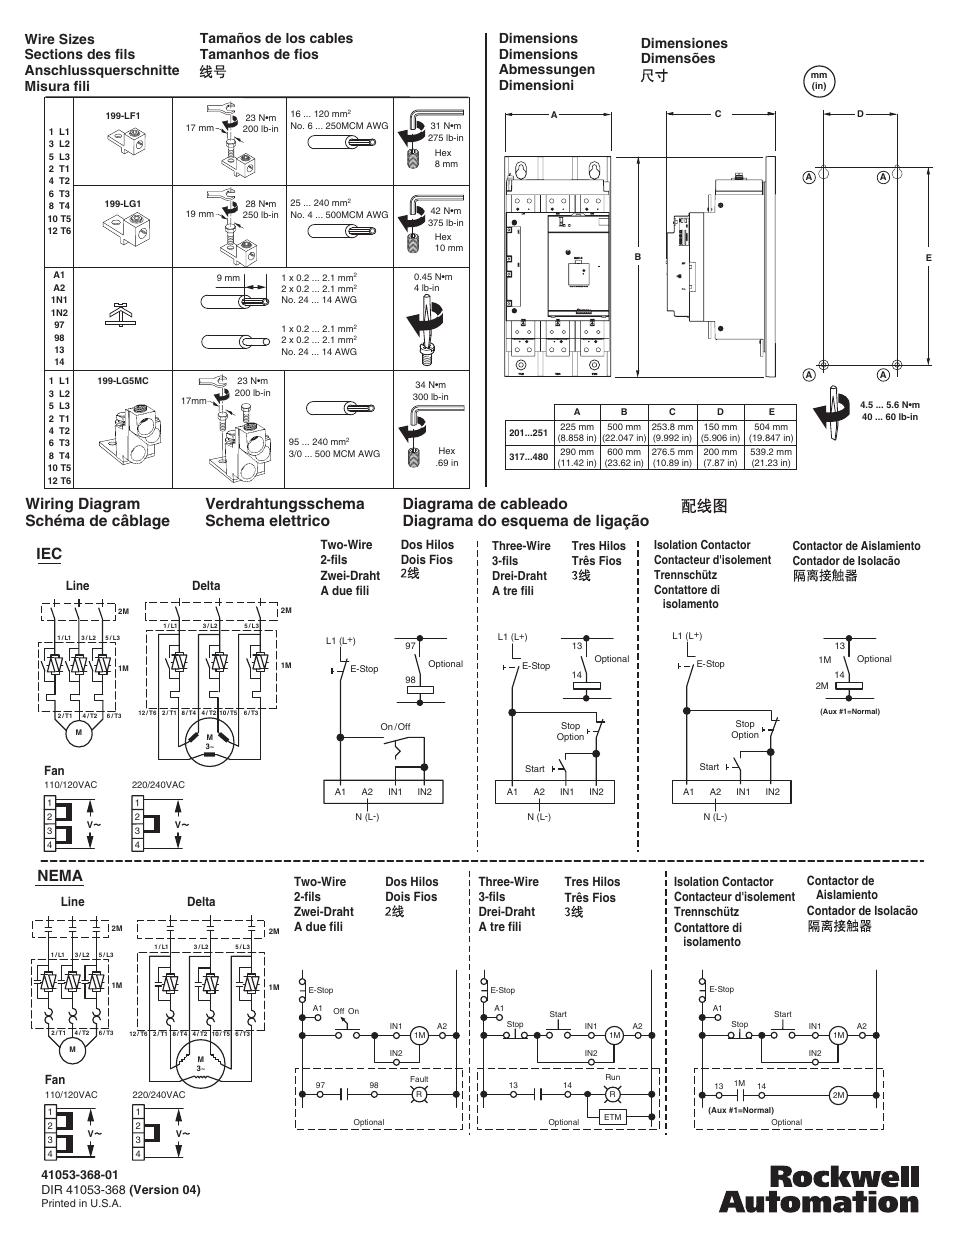 Stunning Smc Wiring Diagrams Images - Wiring schematic - ufc204.us